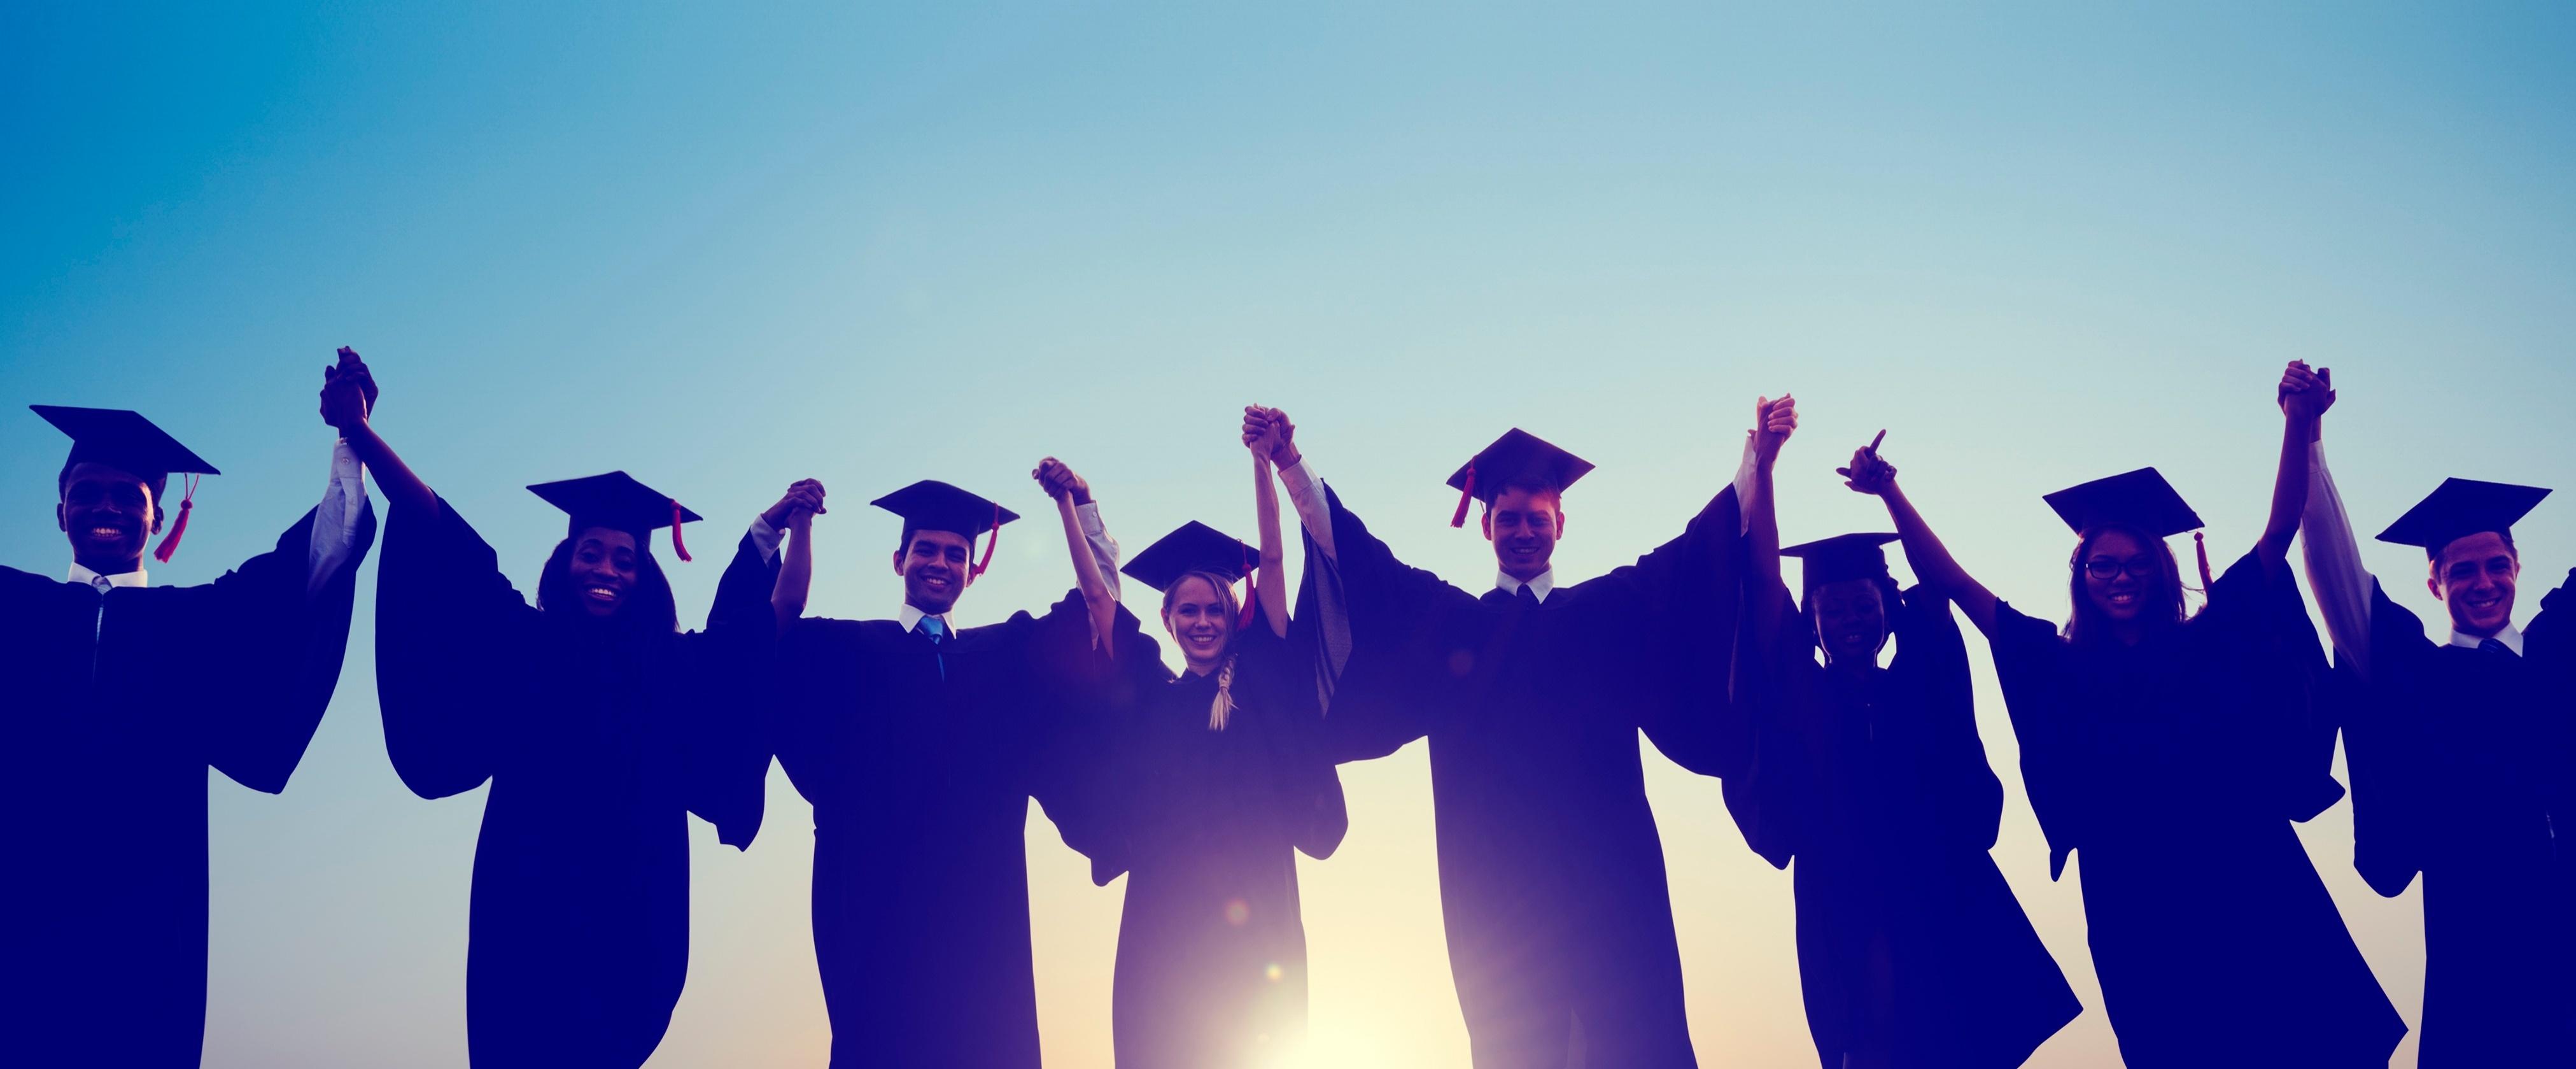 6 Easy High School Graduation Gifts